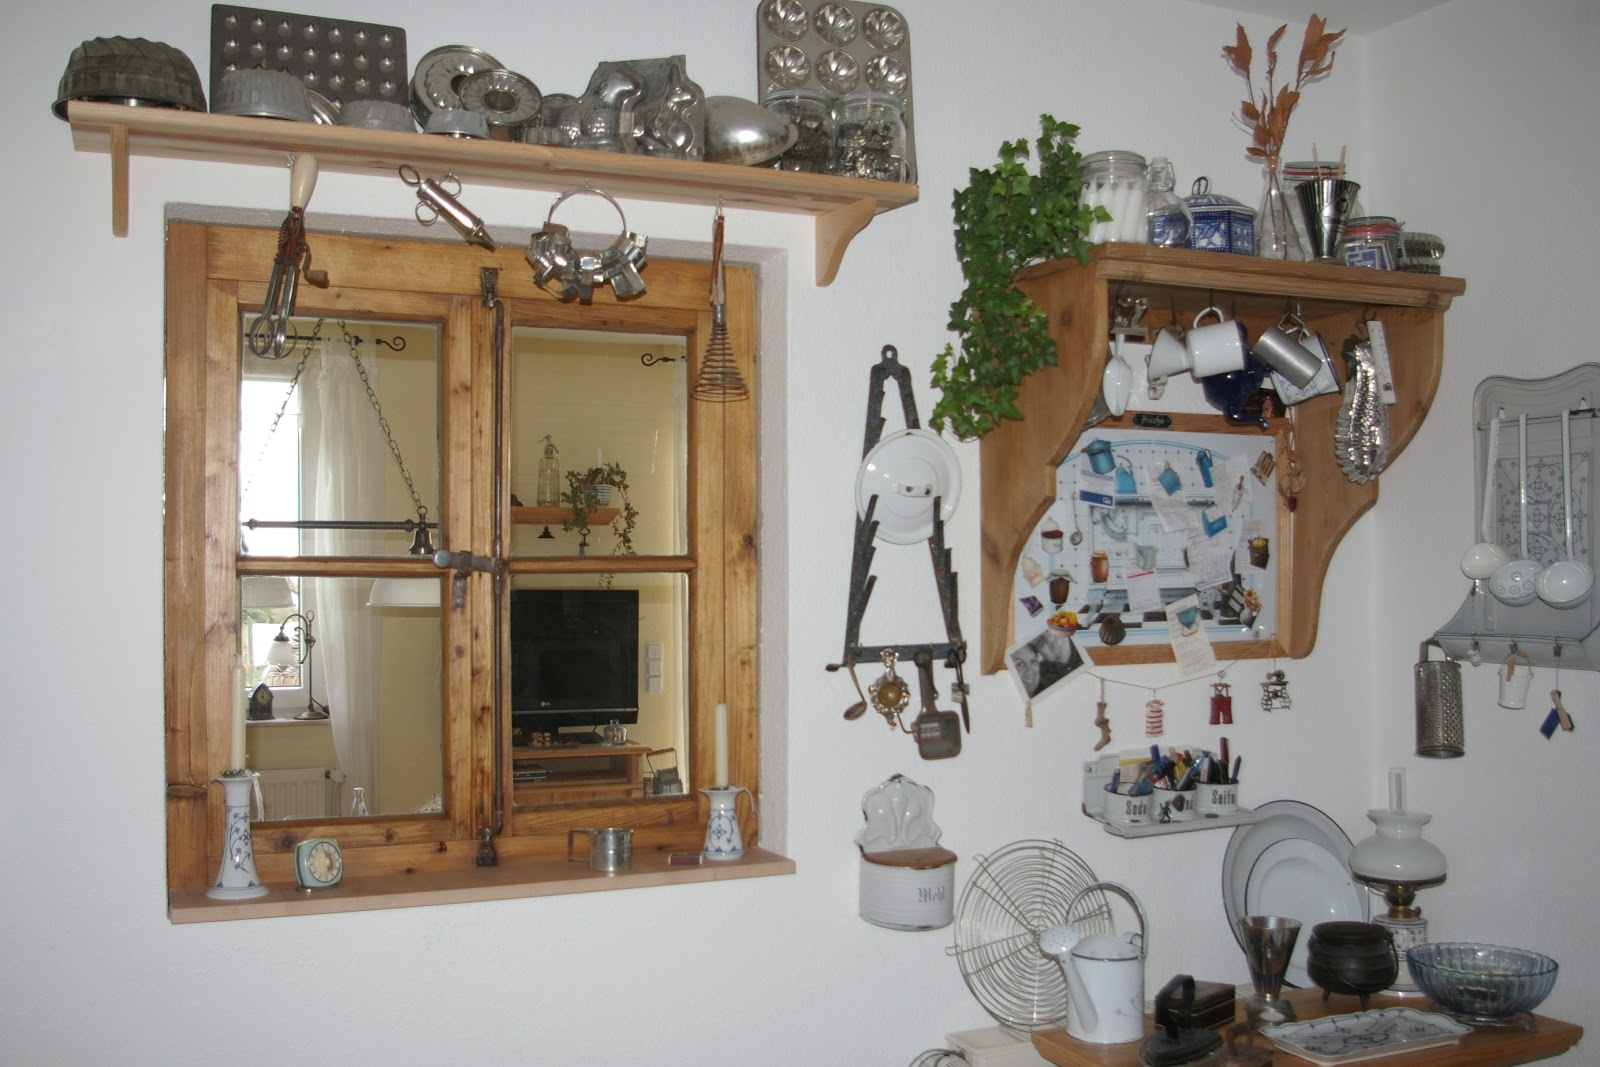 klein e s haus fenster zur k che. Black Bedroom Furniture Sets. Home Design Ideas